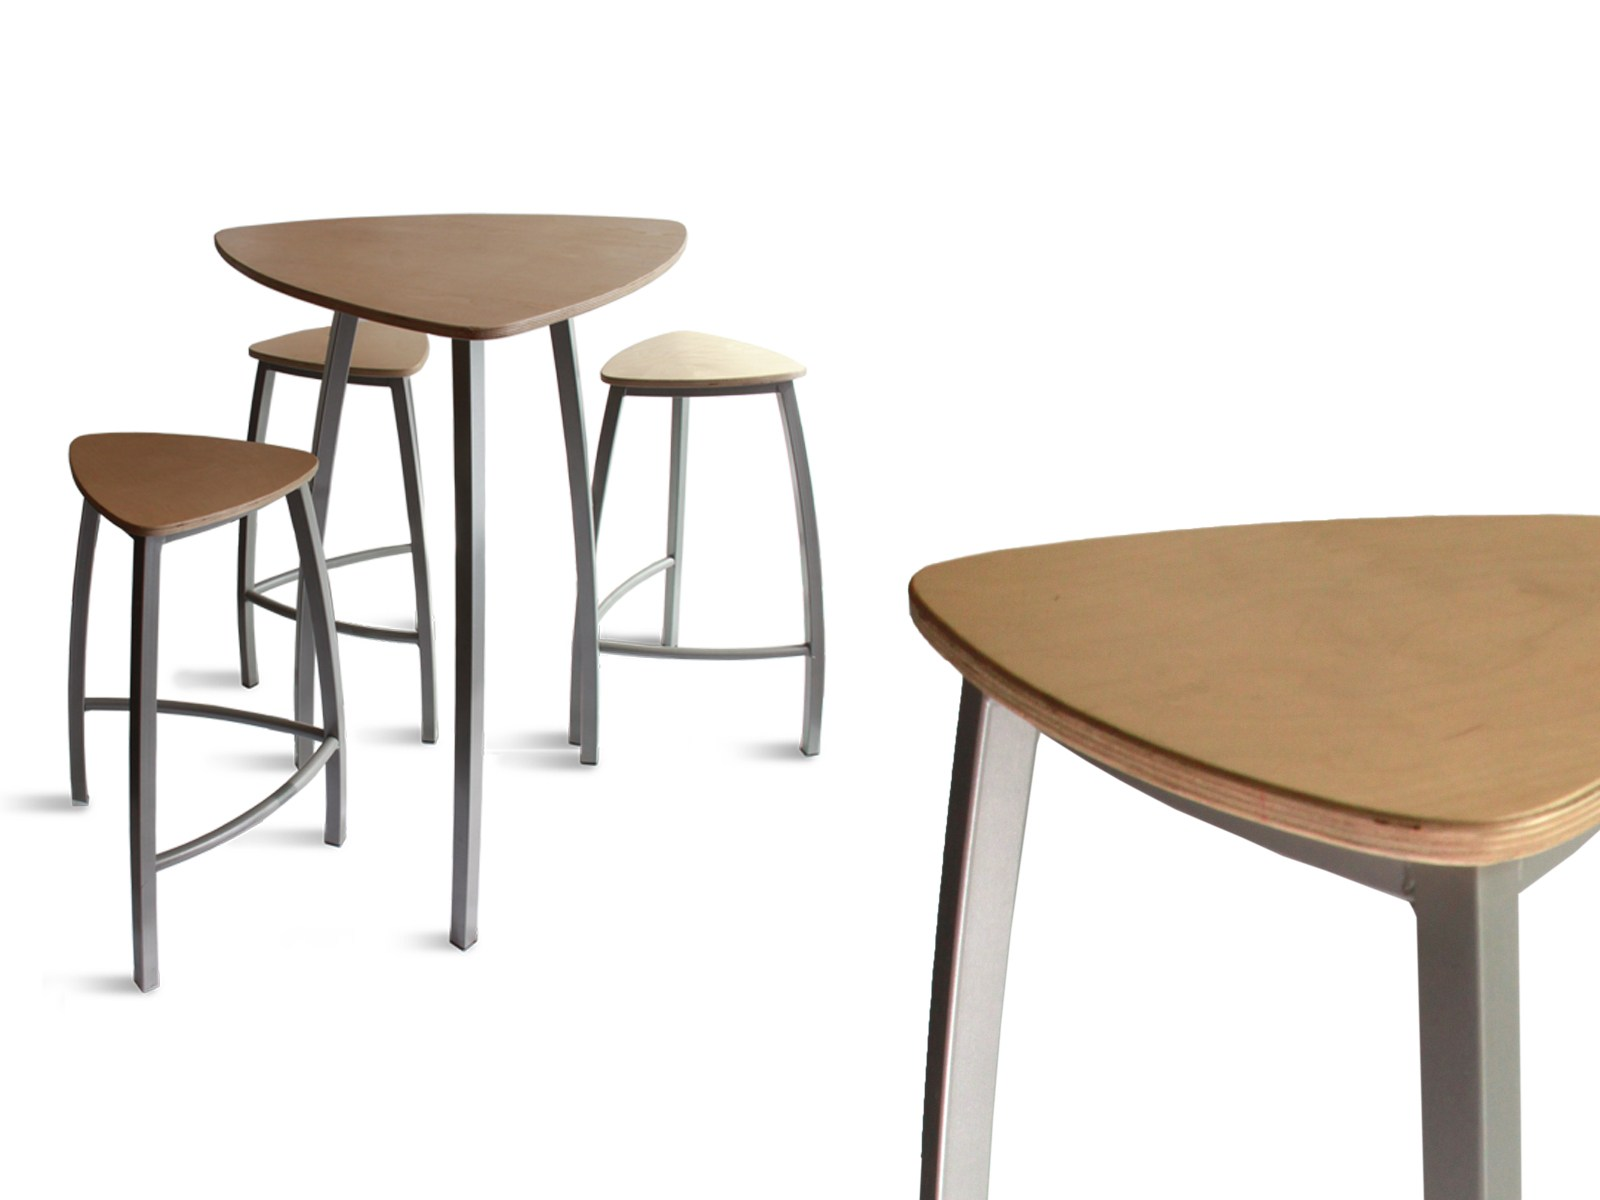 Delta sgabello by collection maison design arielle d for Arielle d collection maison